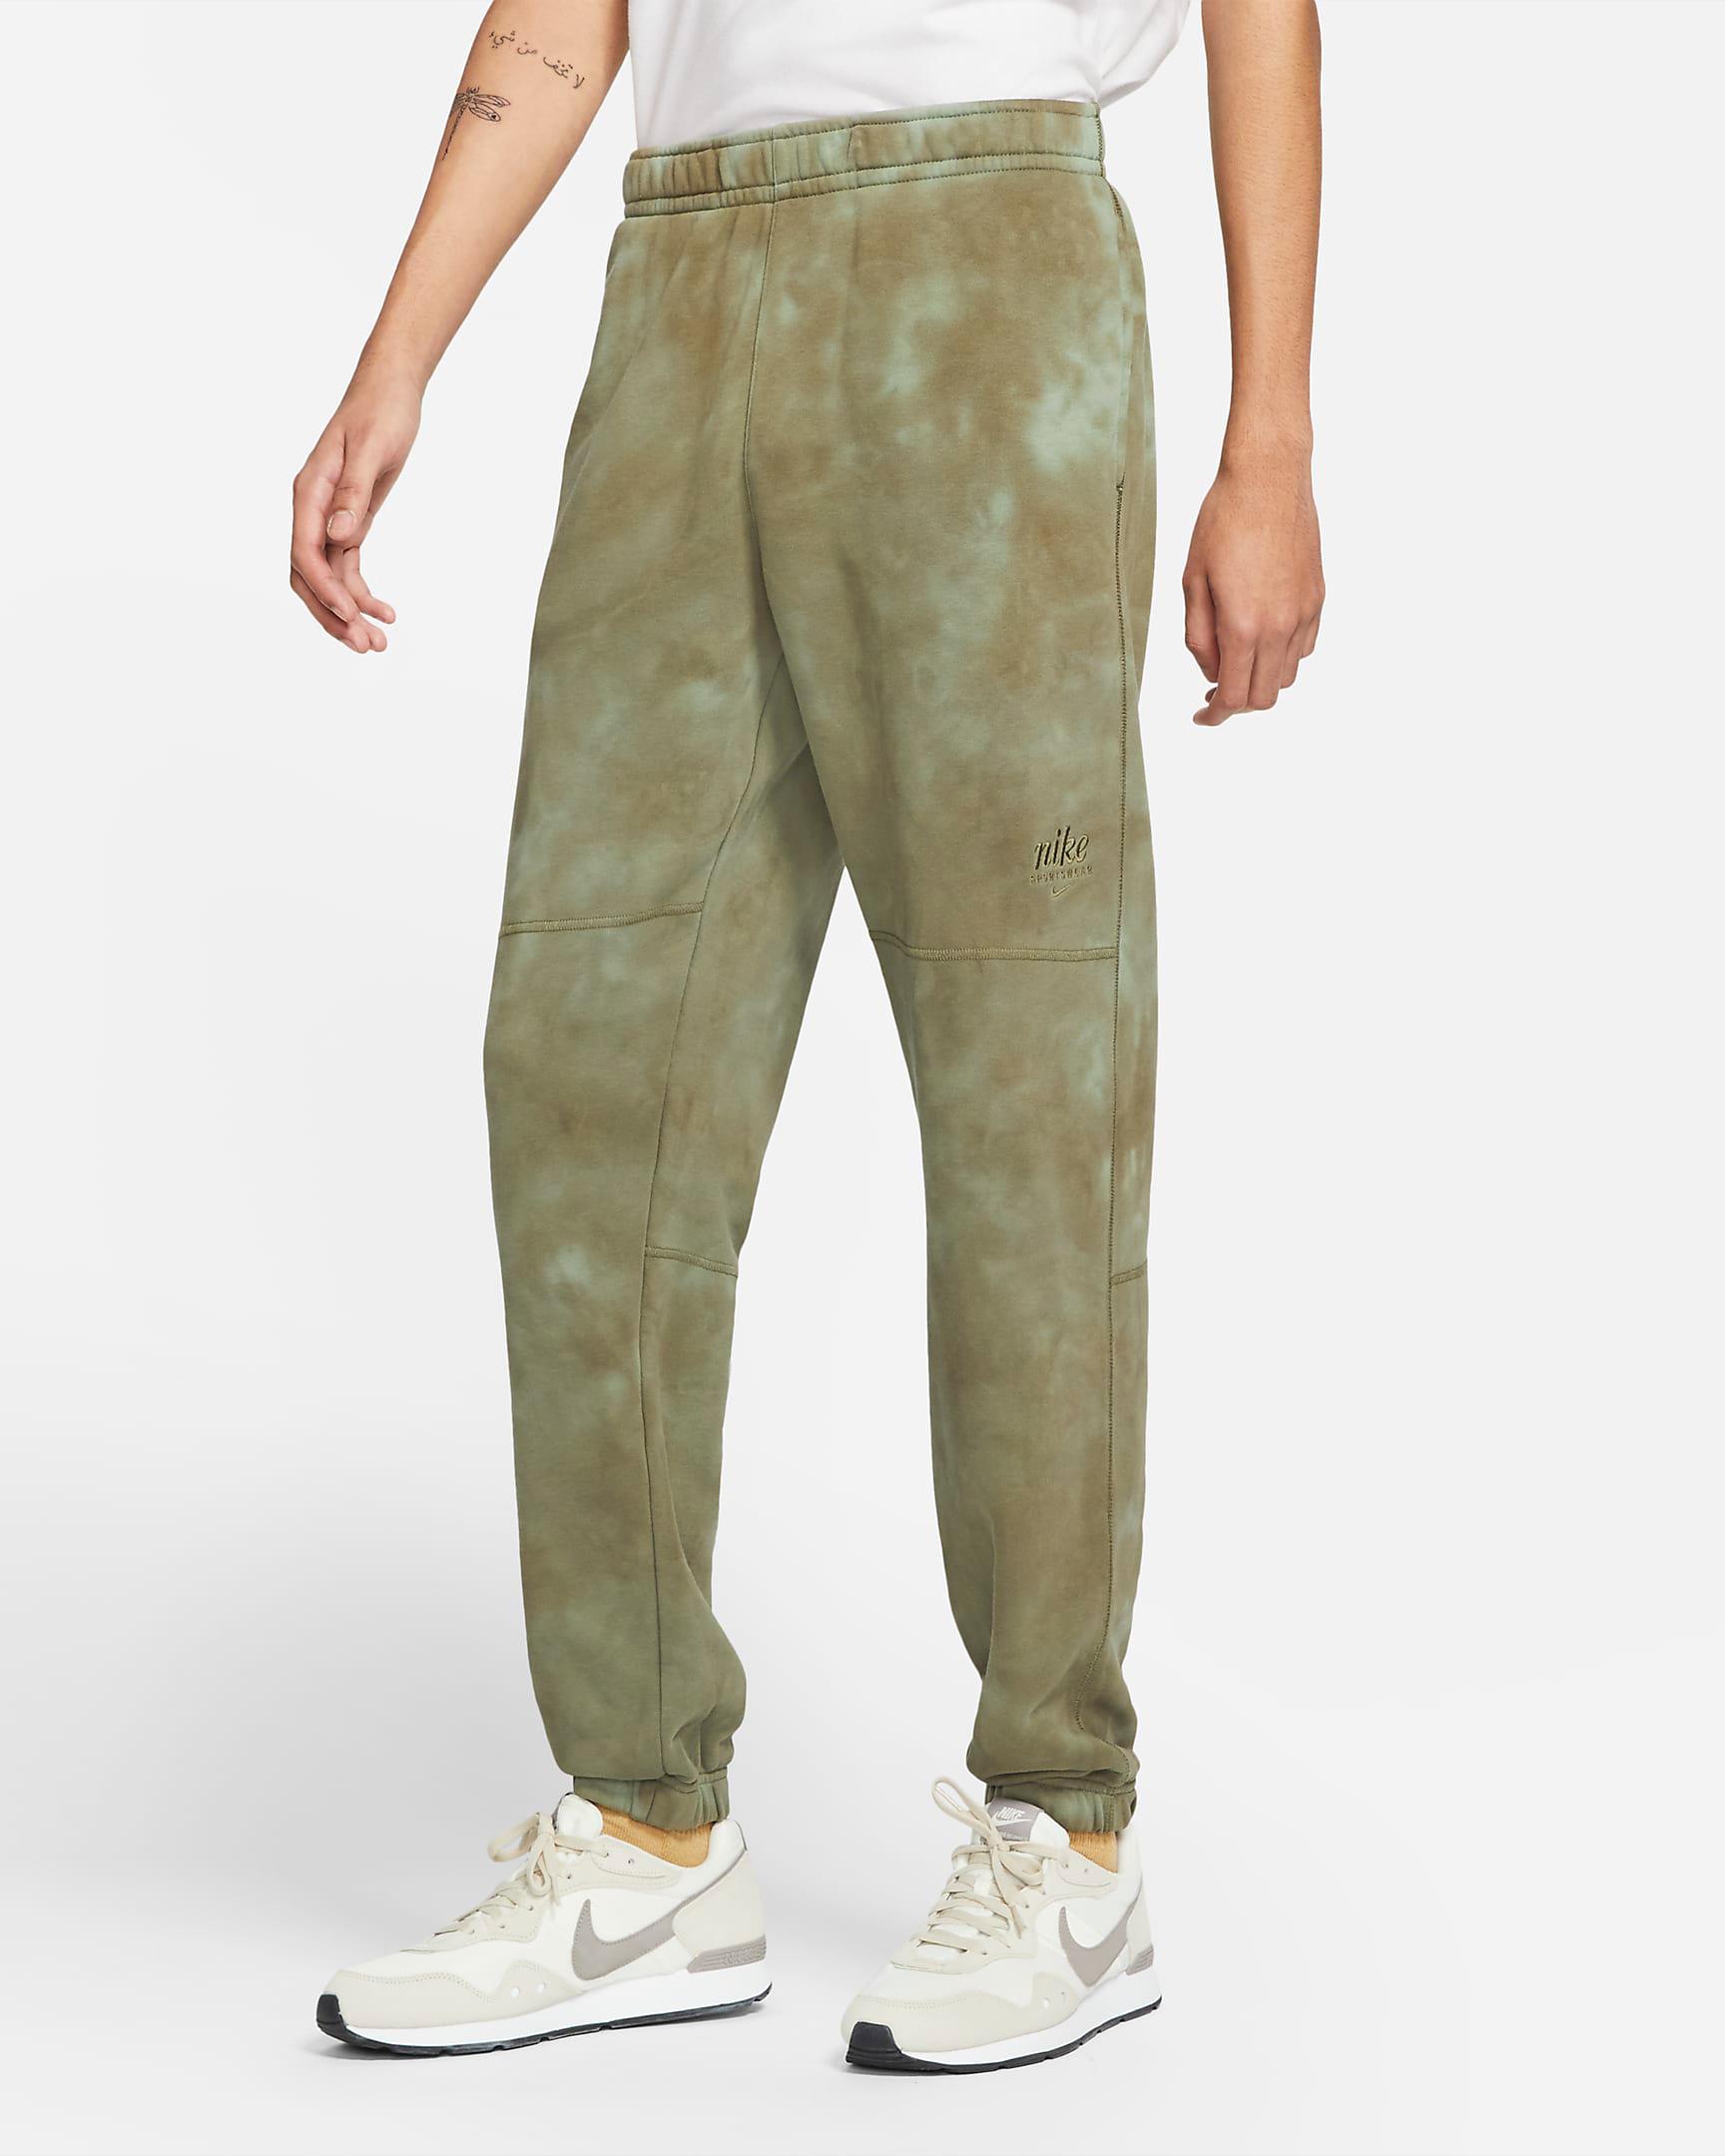 nike-club-fleece-tie-dye-jogger-pants-green-1